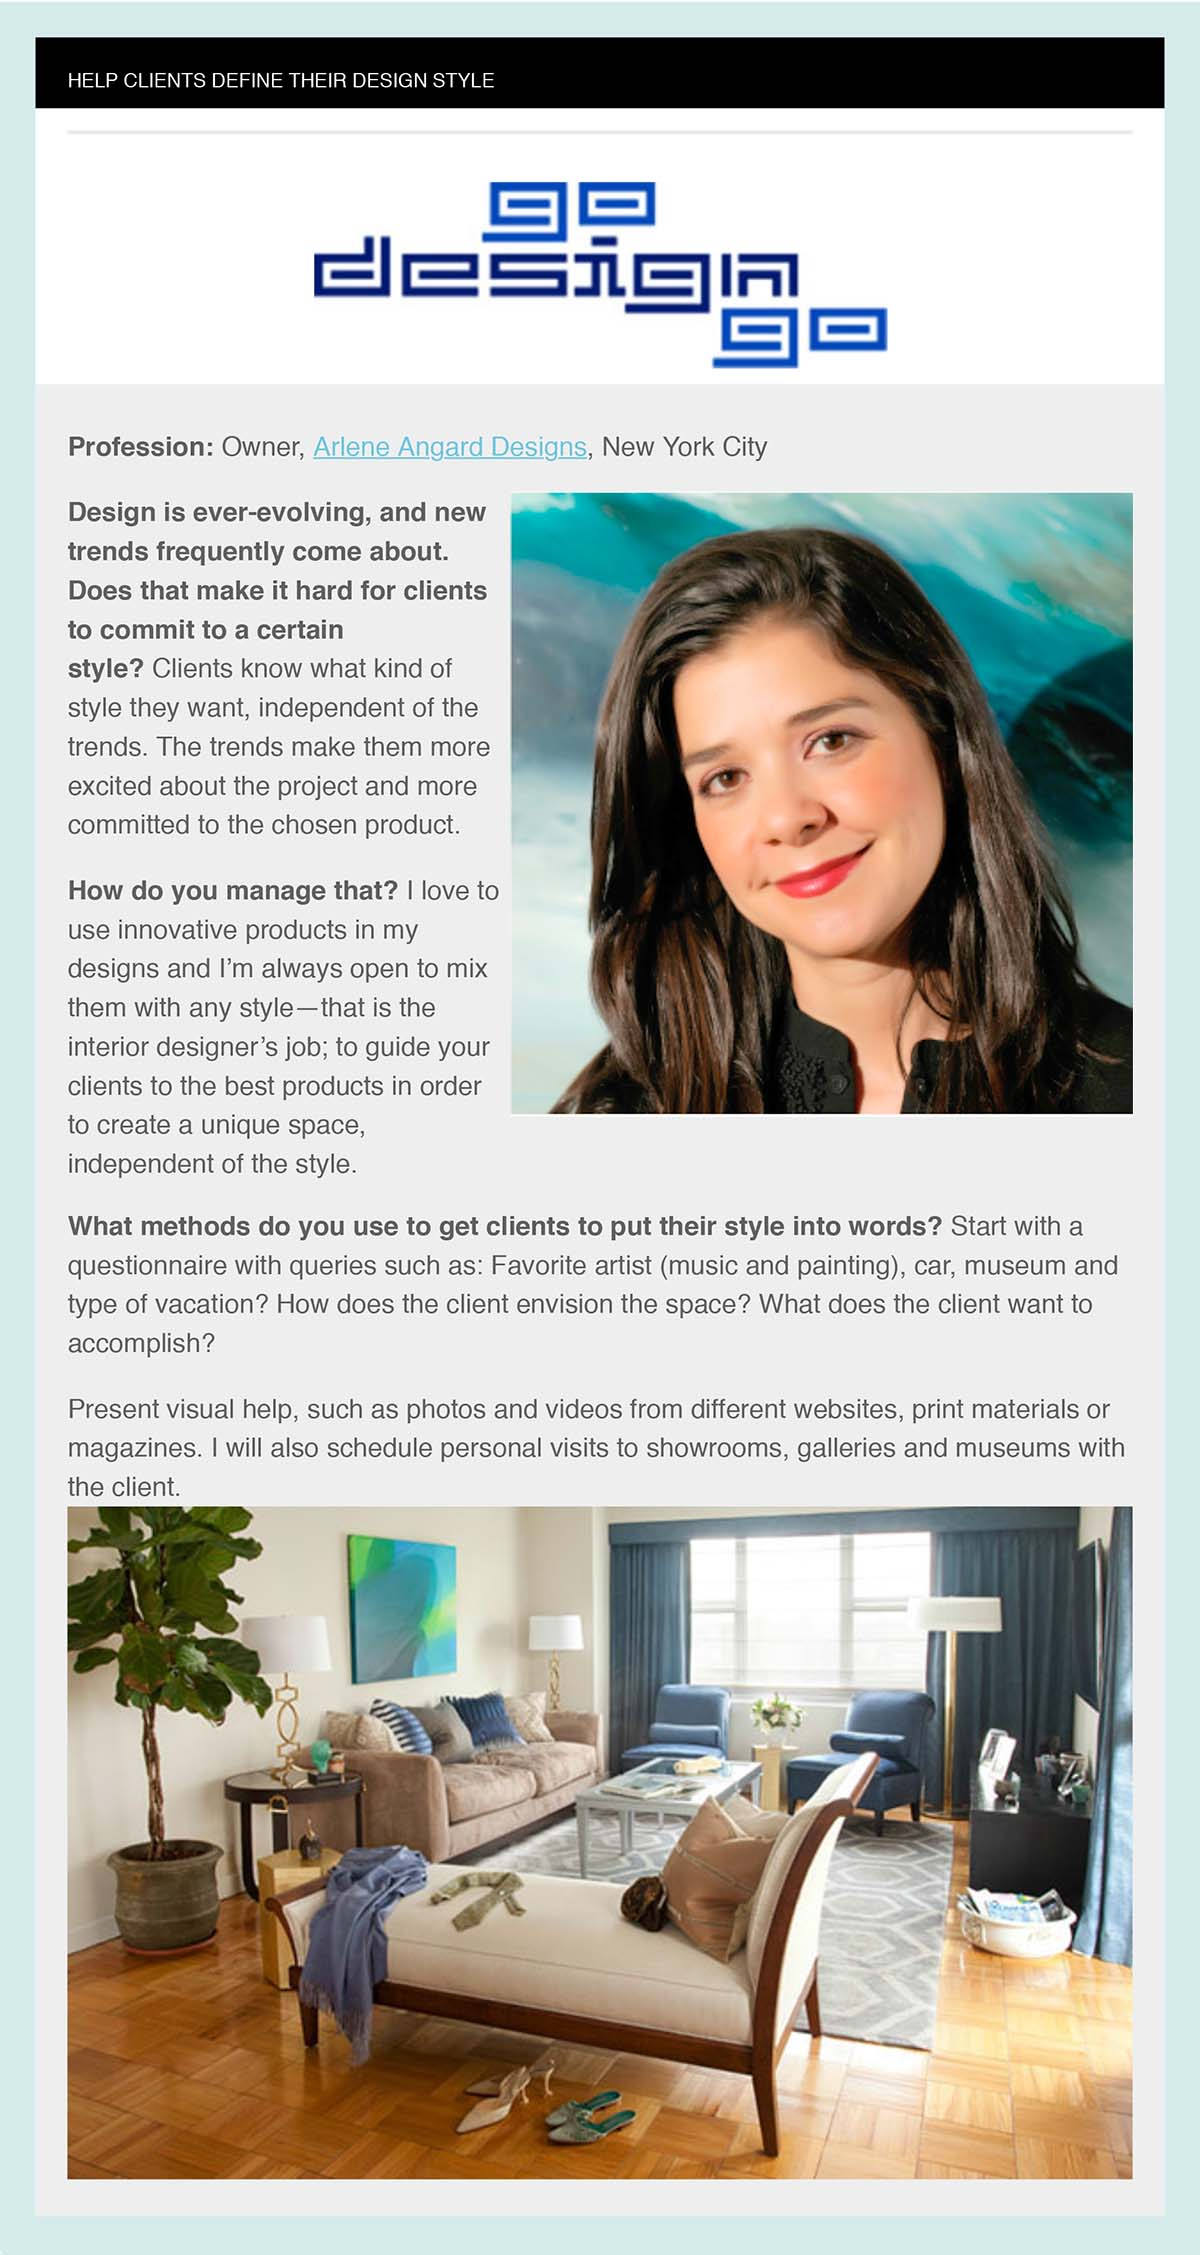 Arlene Angard Featured on Go Design Gos Web Site